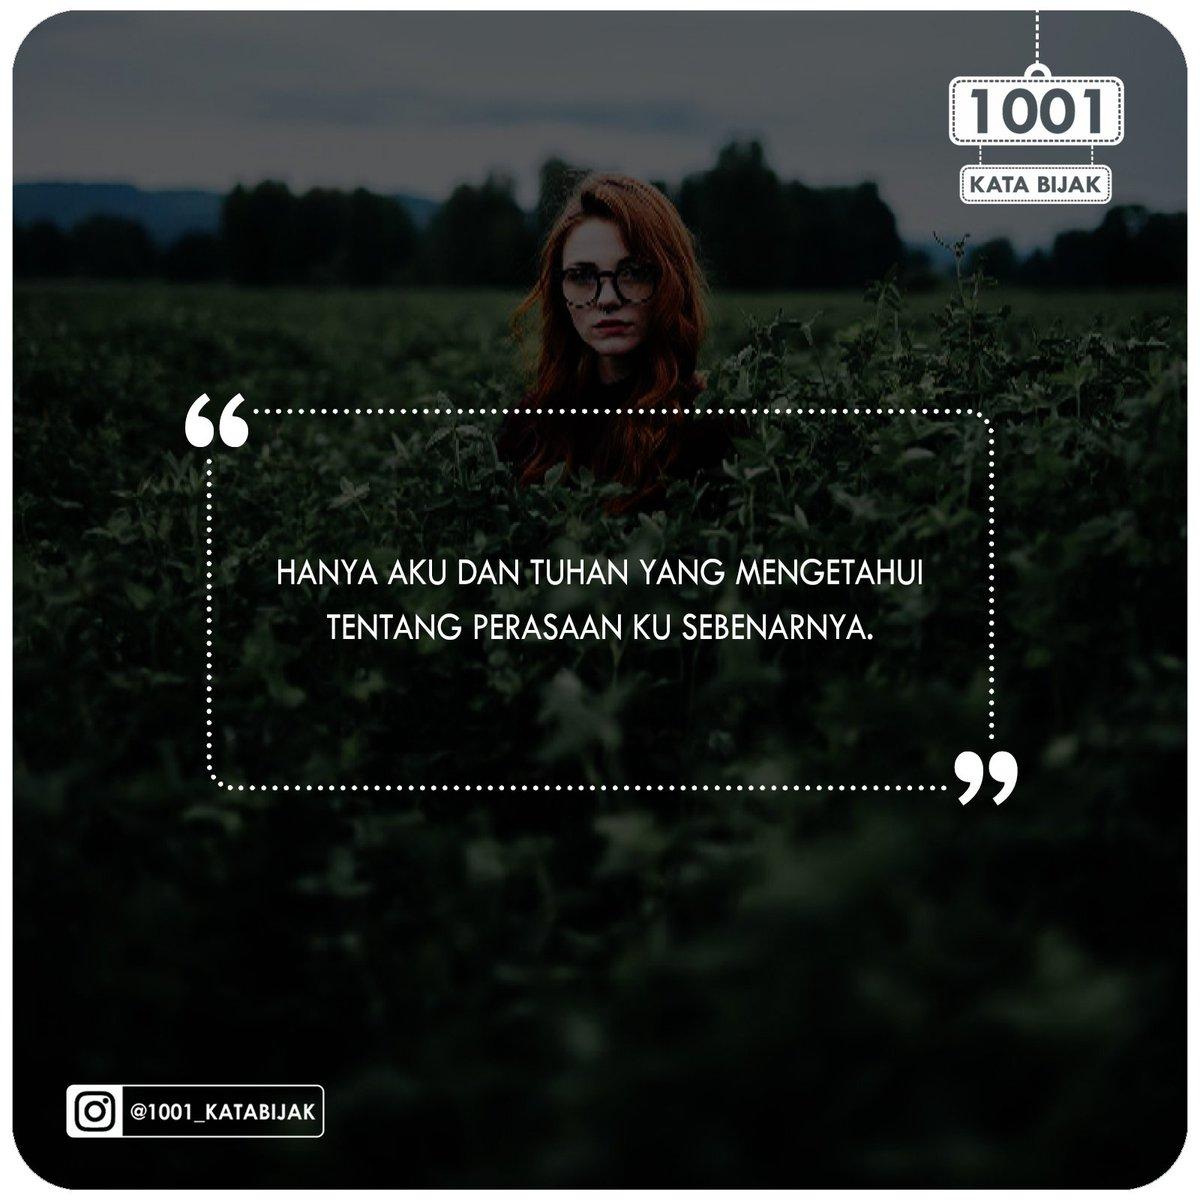 1001katabijak Hashtag On Twitter